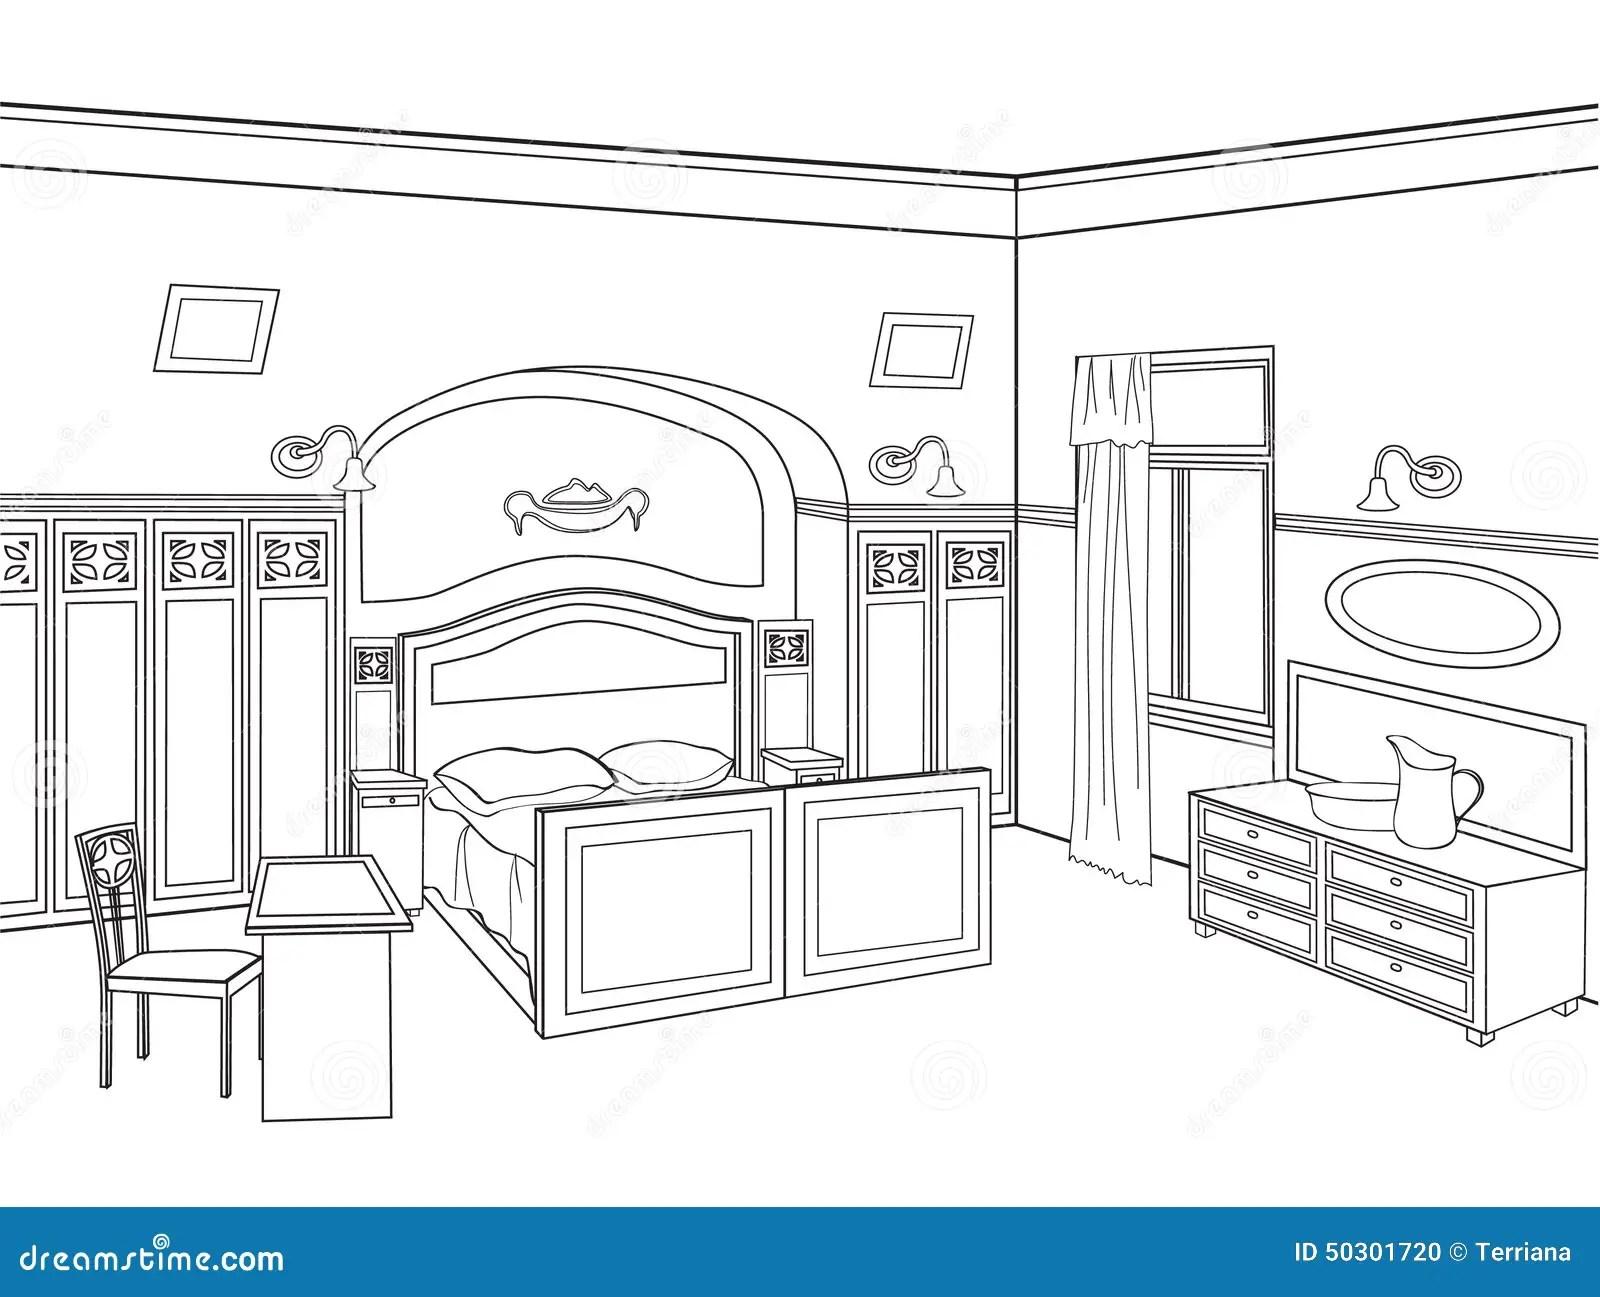 Bedroom Furniture Room Interior In Retro Style Stock